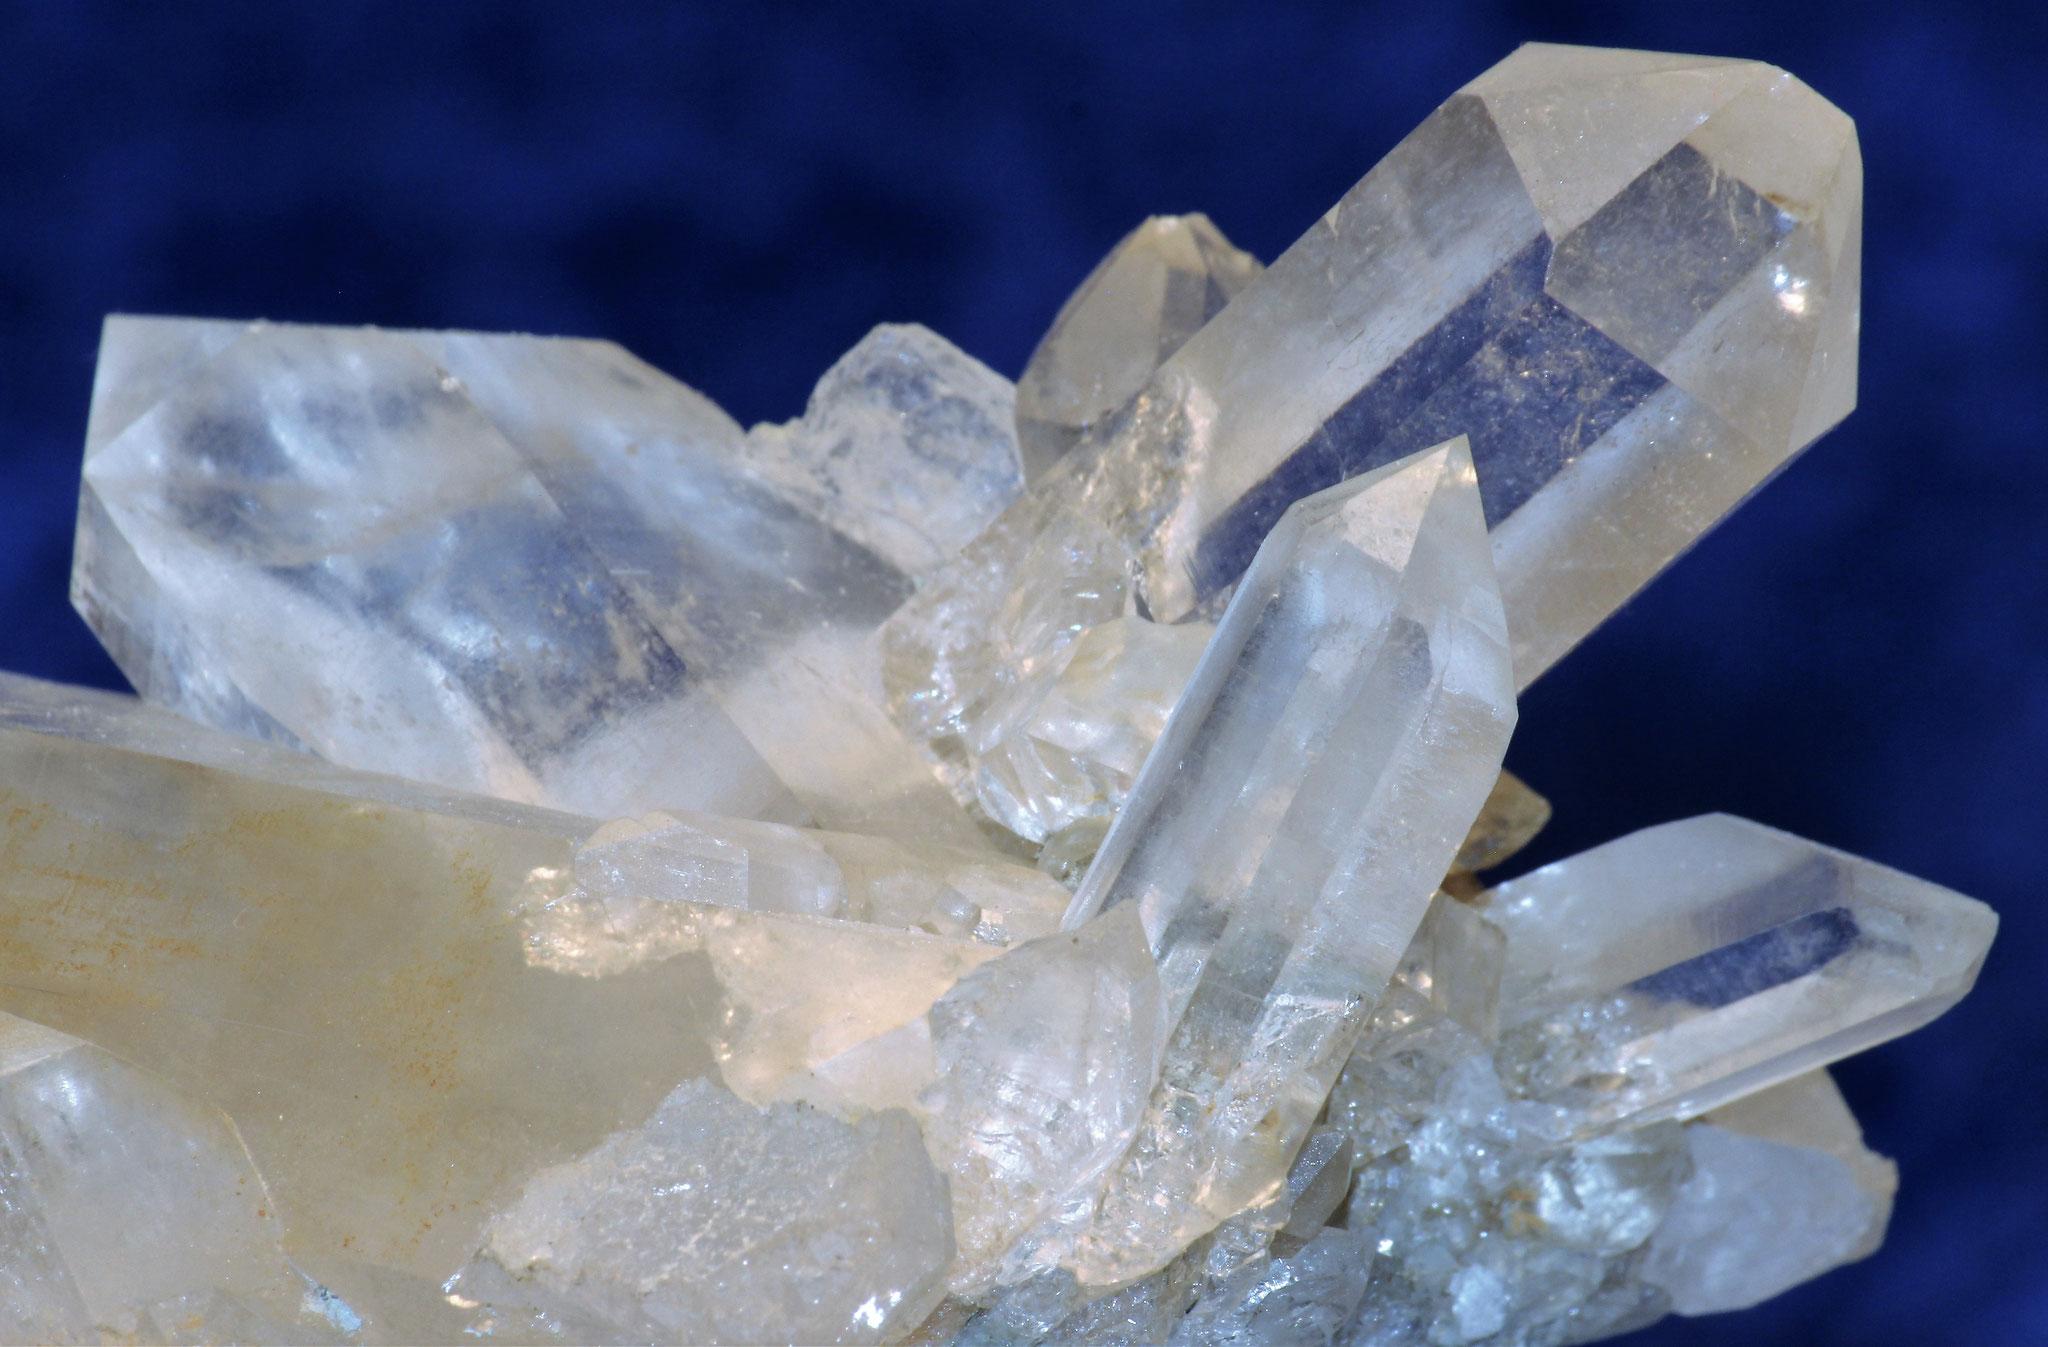 Bergkristall, Maderanertal (UR)